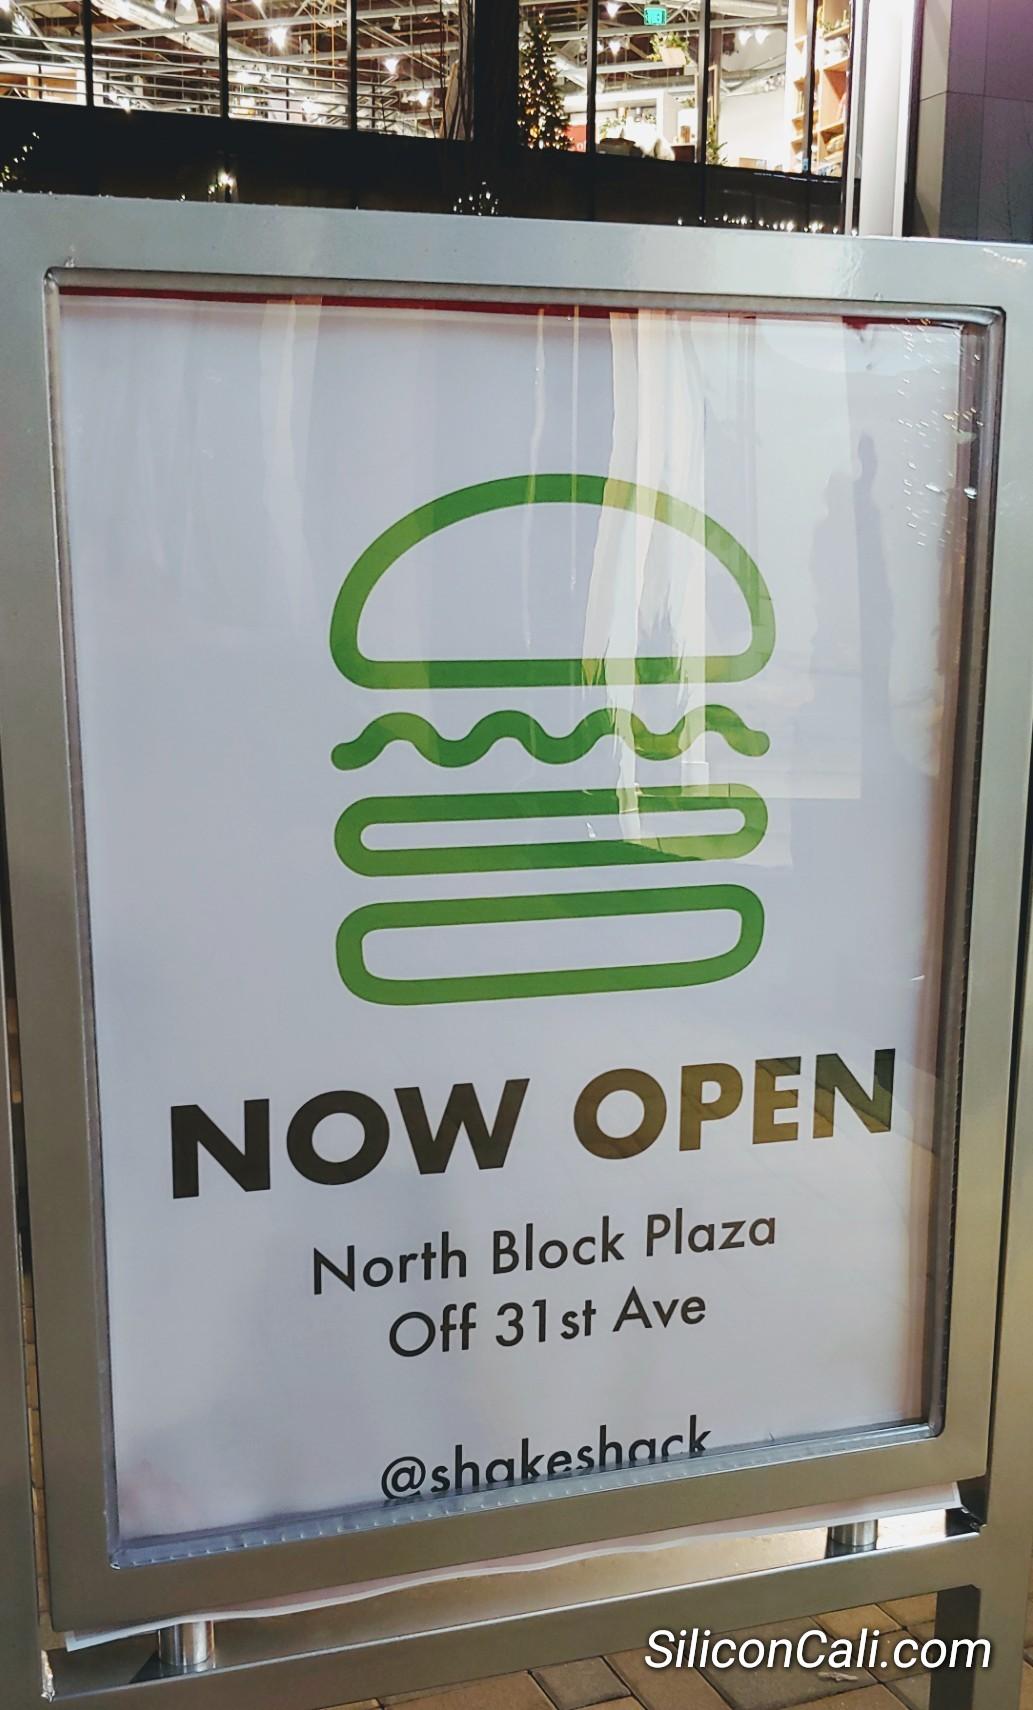 Shake_Shack_San_Mateo_now_open_sign